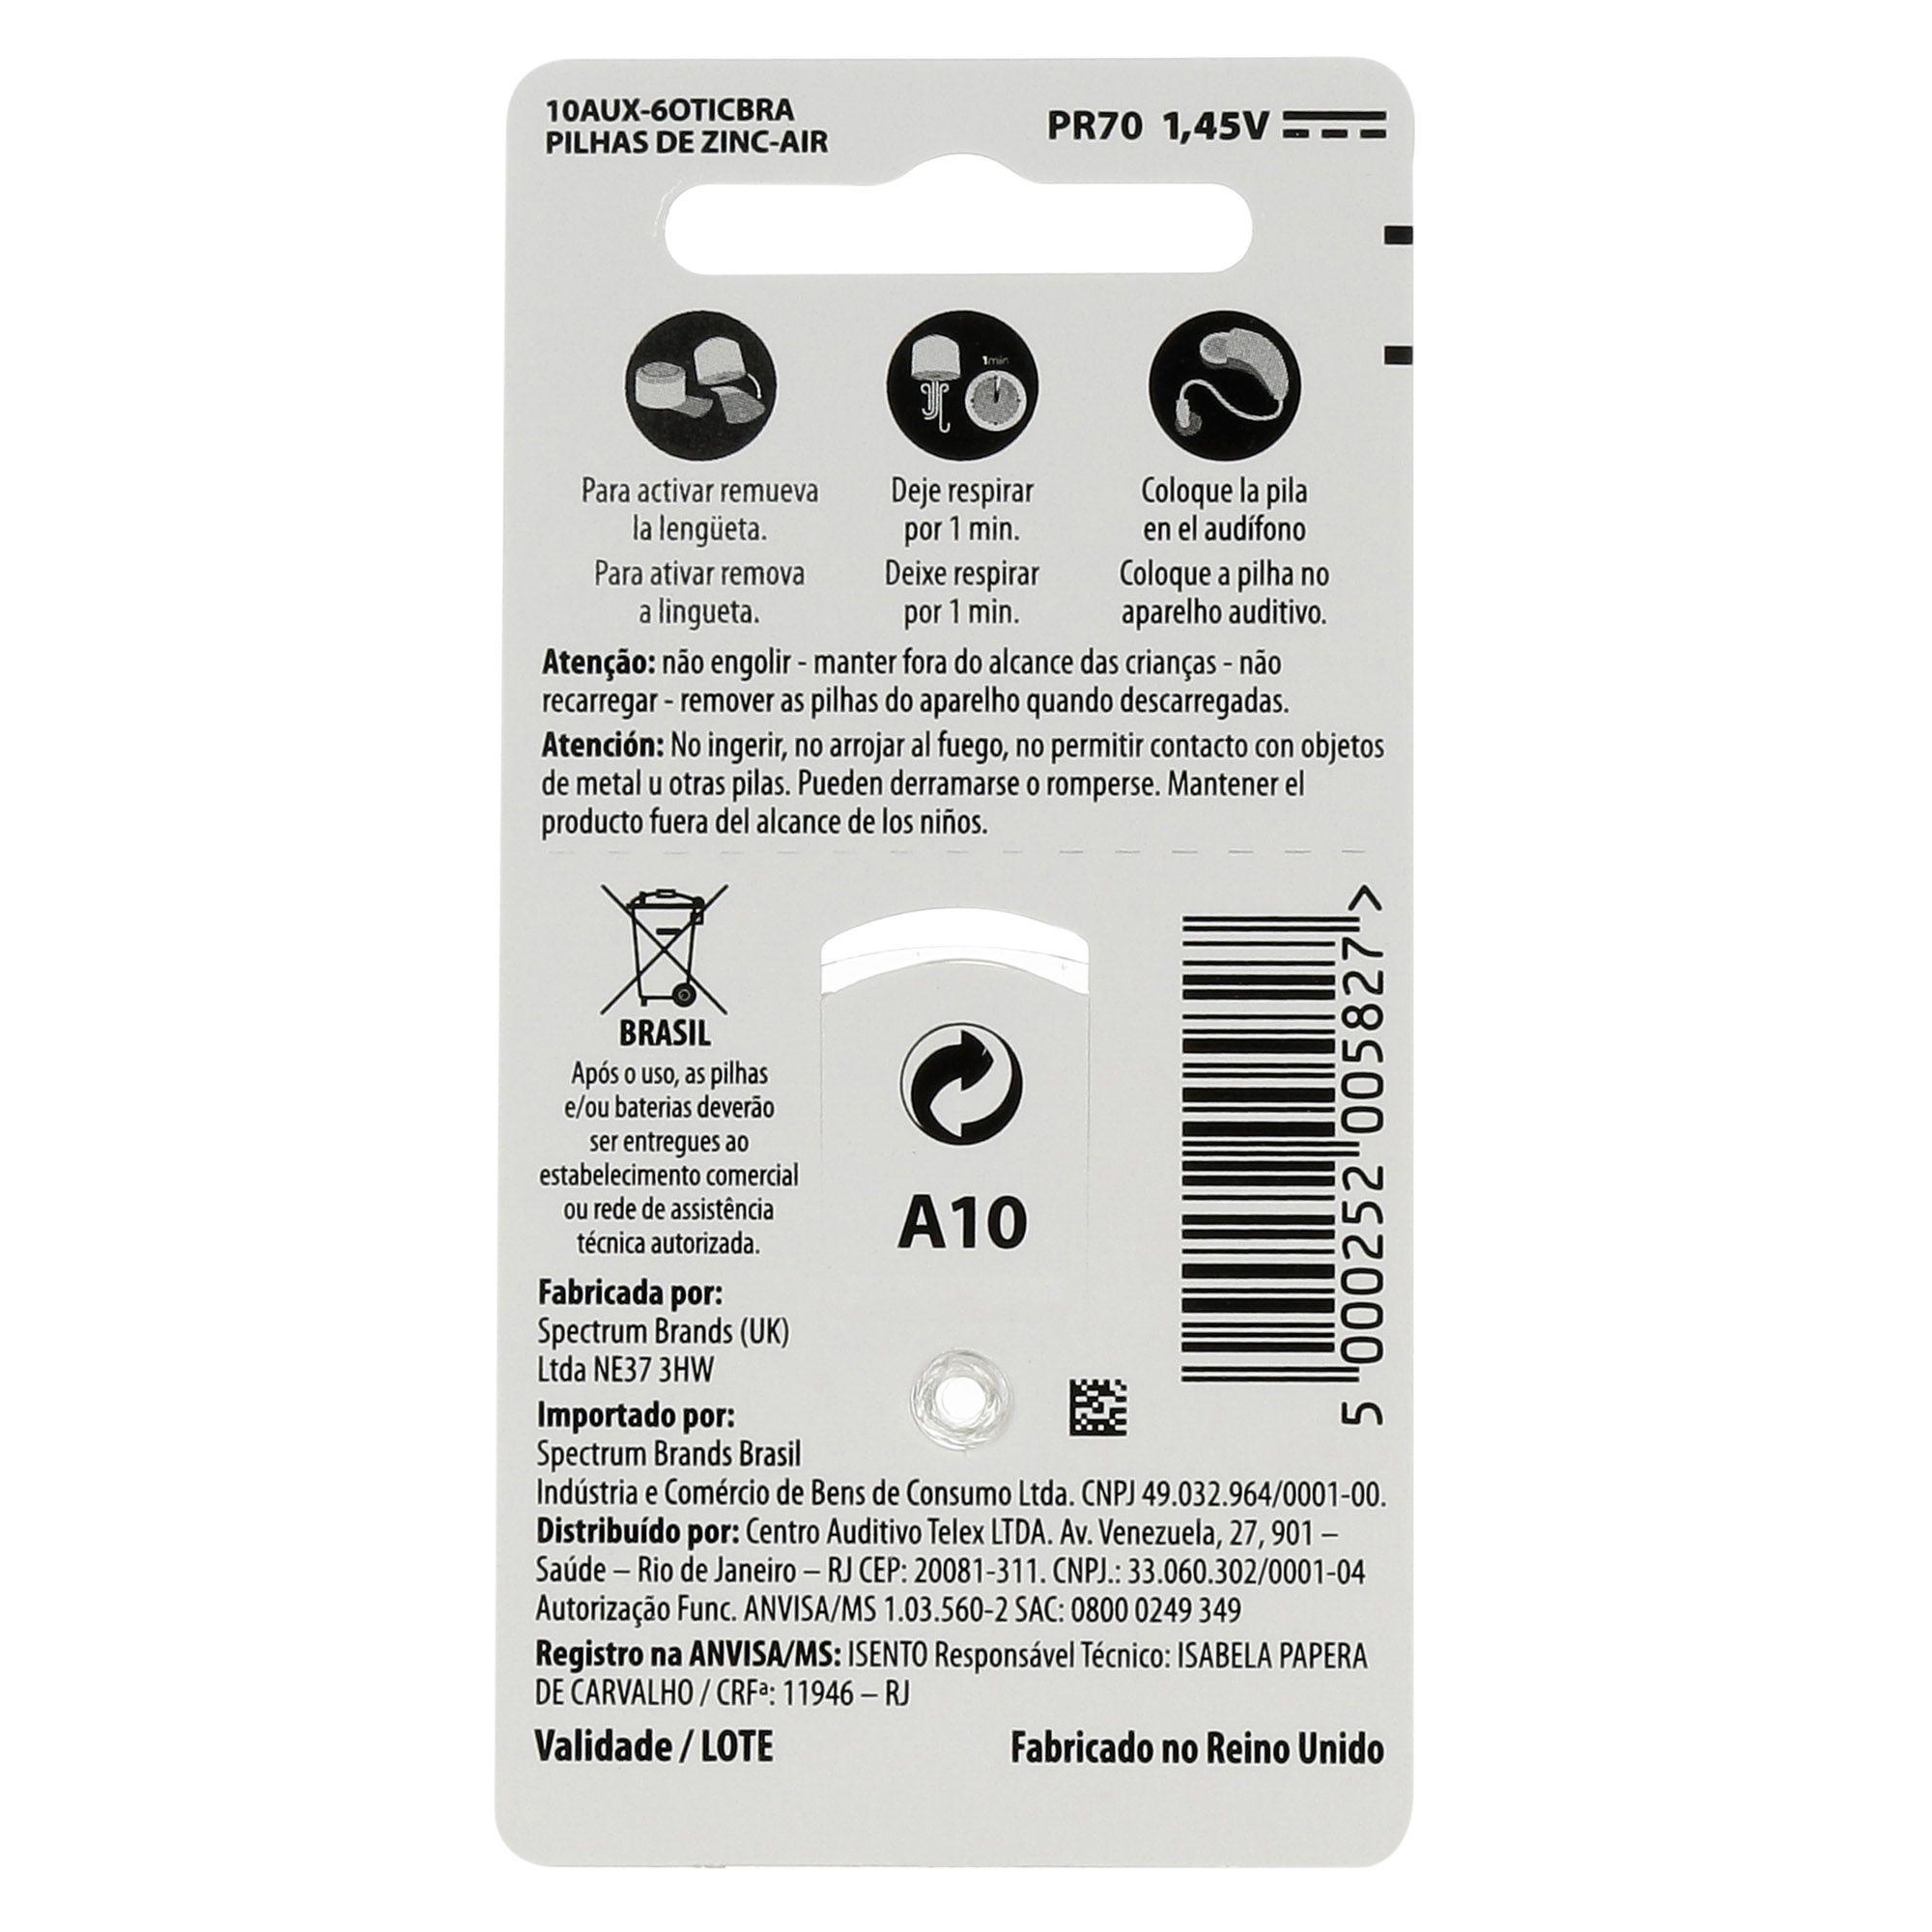 OTICON 10 / PR70 - 1 Cartela - 6 Baterias para Aparelho Auditivo  - SONORA